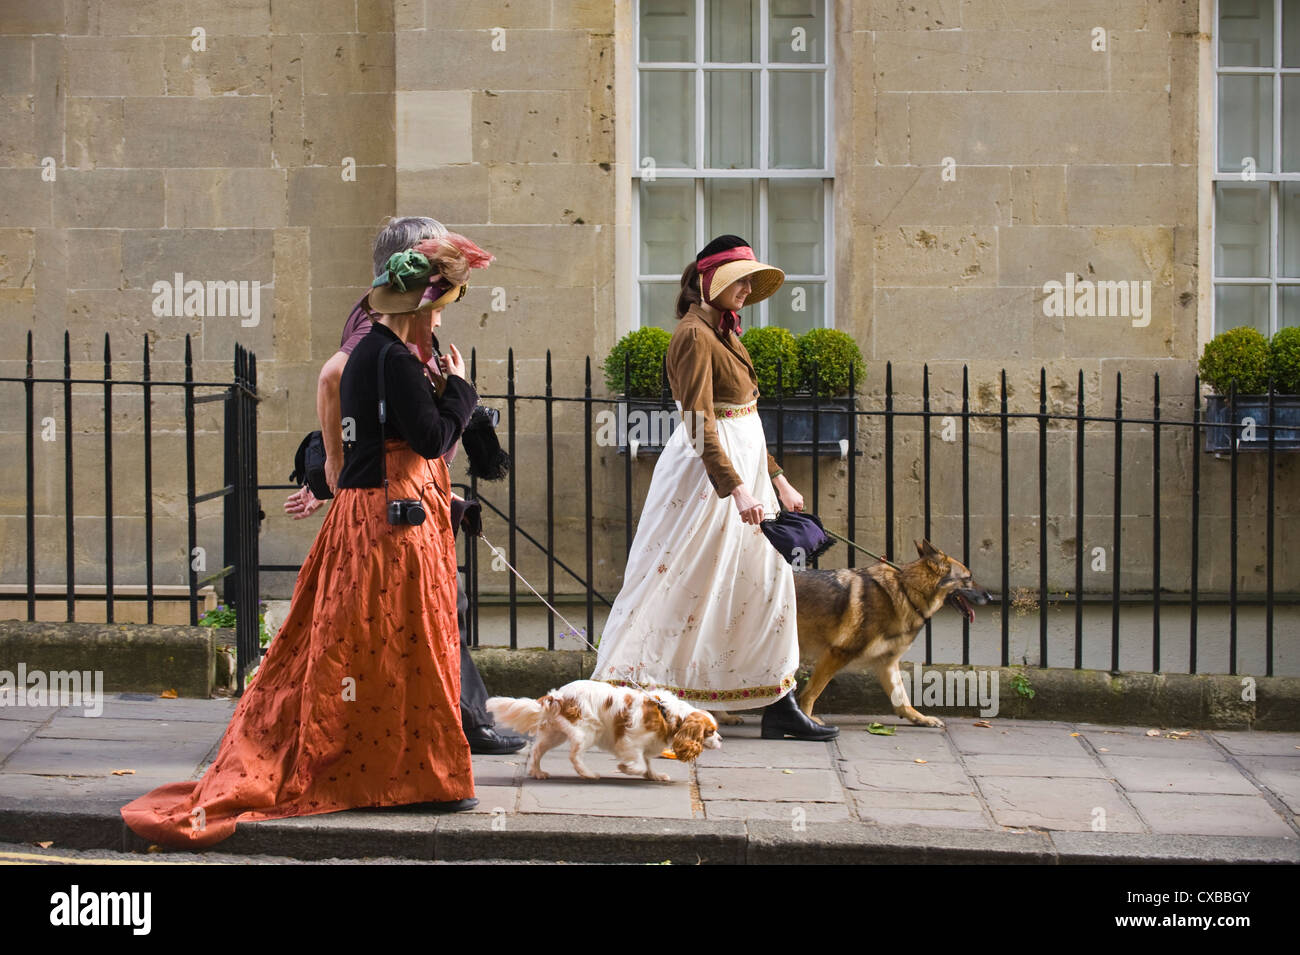 Two women in Regency costume walking dogs through Bath city centre  during the 2012 Jane AustenWoman walking in Bath on a rainy night  A lady walks by Pulteney  . Dog Walkers Bath Area. Home Design Ideas